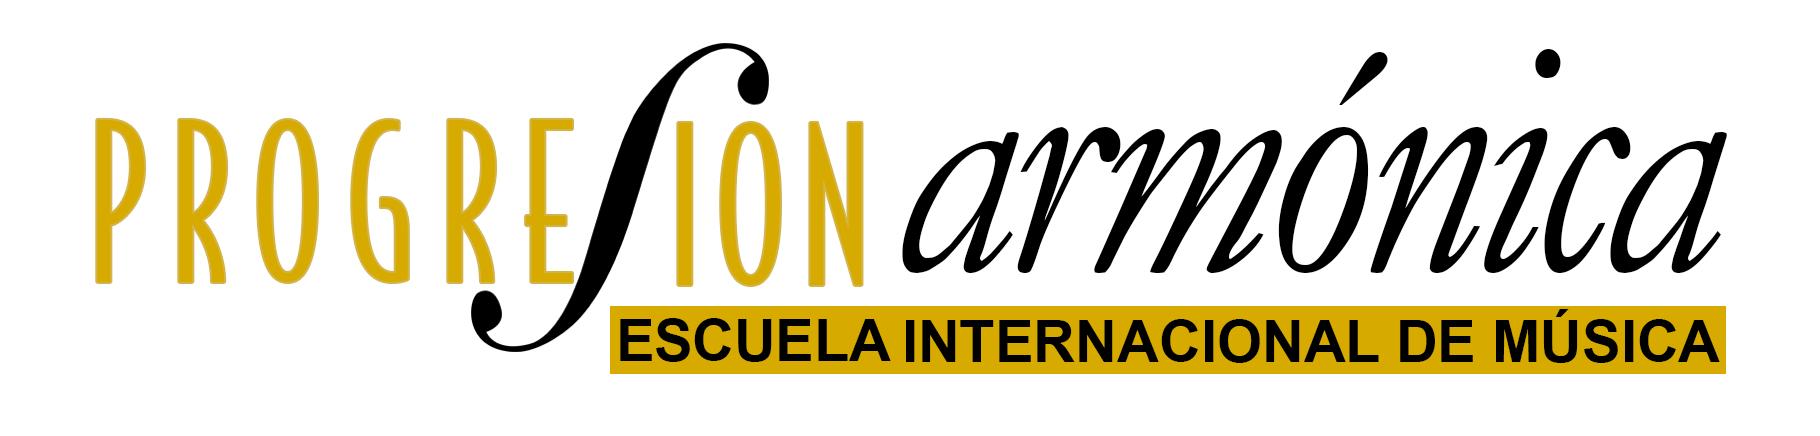 Escuela Internacional de Música Progresión Armónica